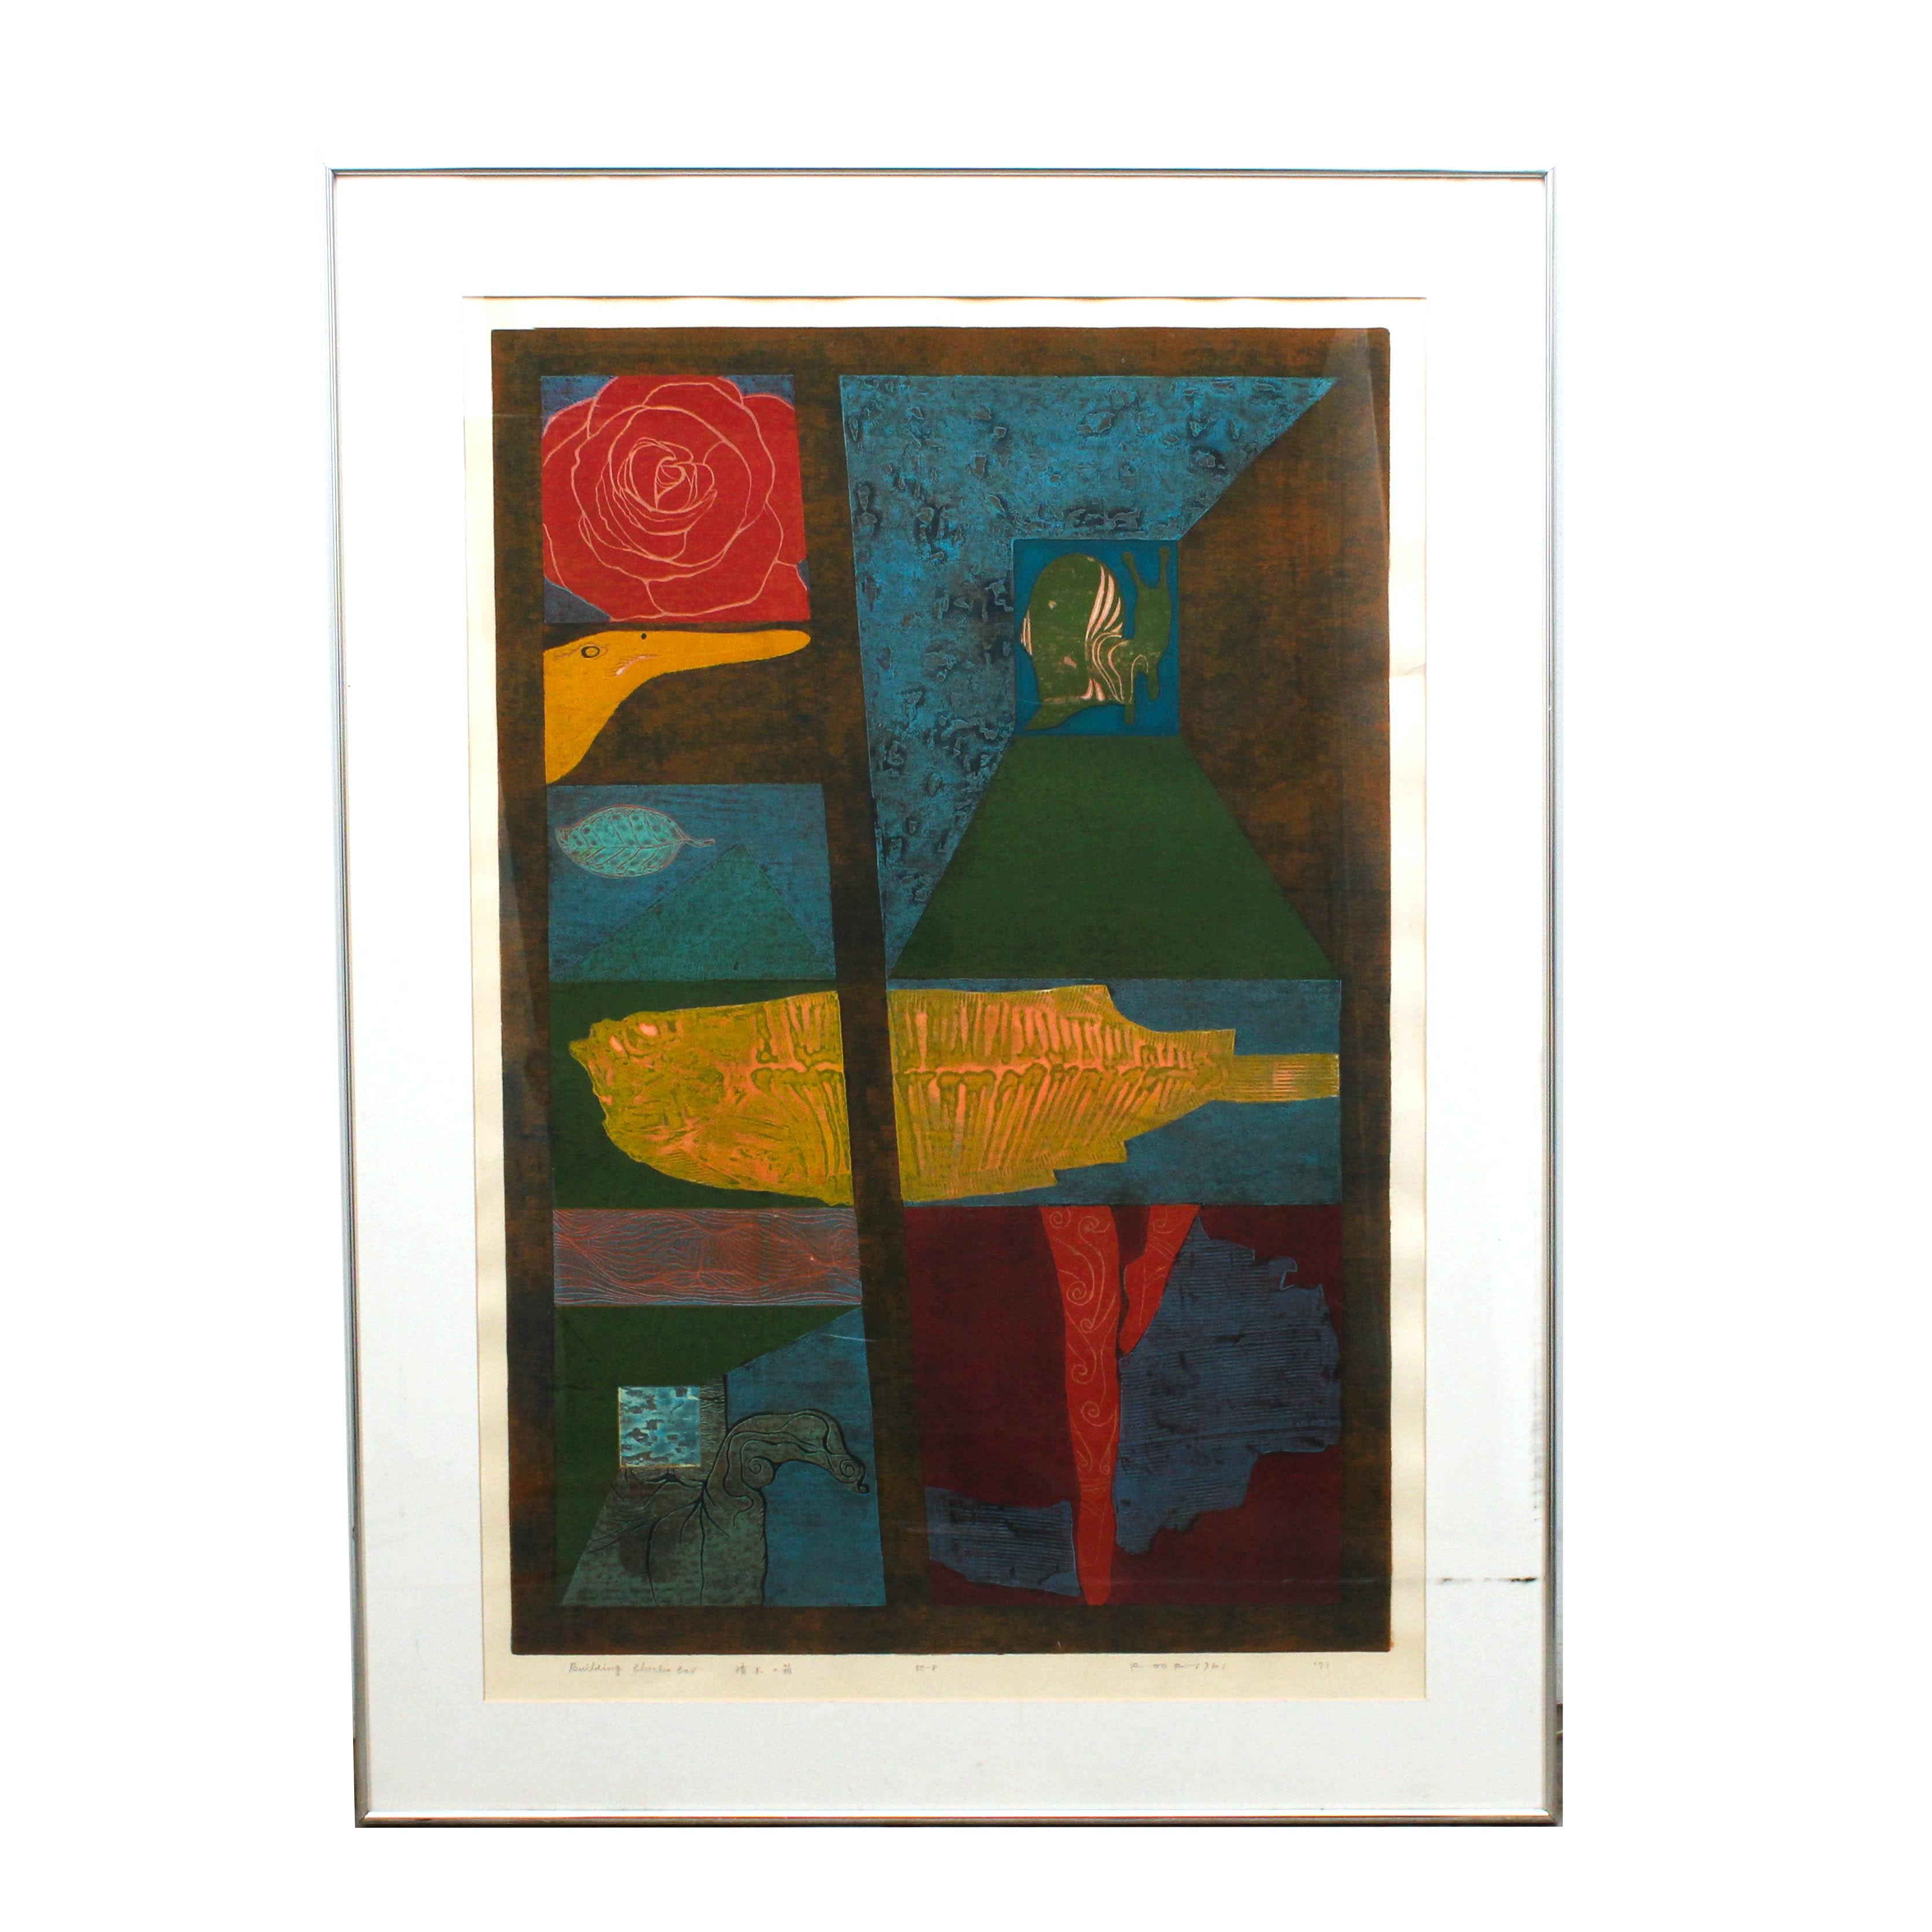 "Koo Kishi ""Building Blocks Box"" Limited Edition Woodblock Print"